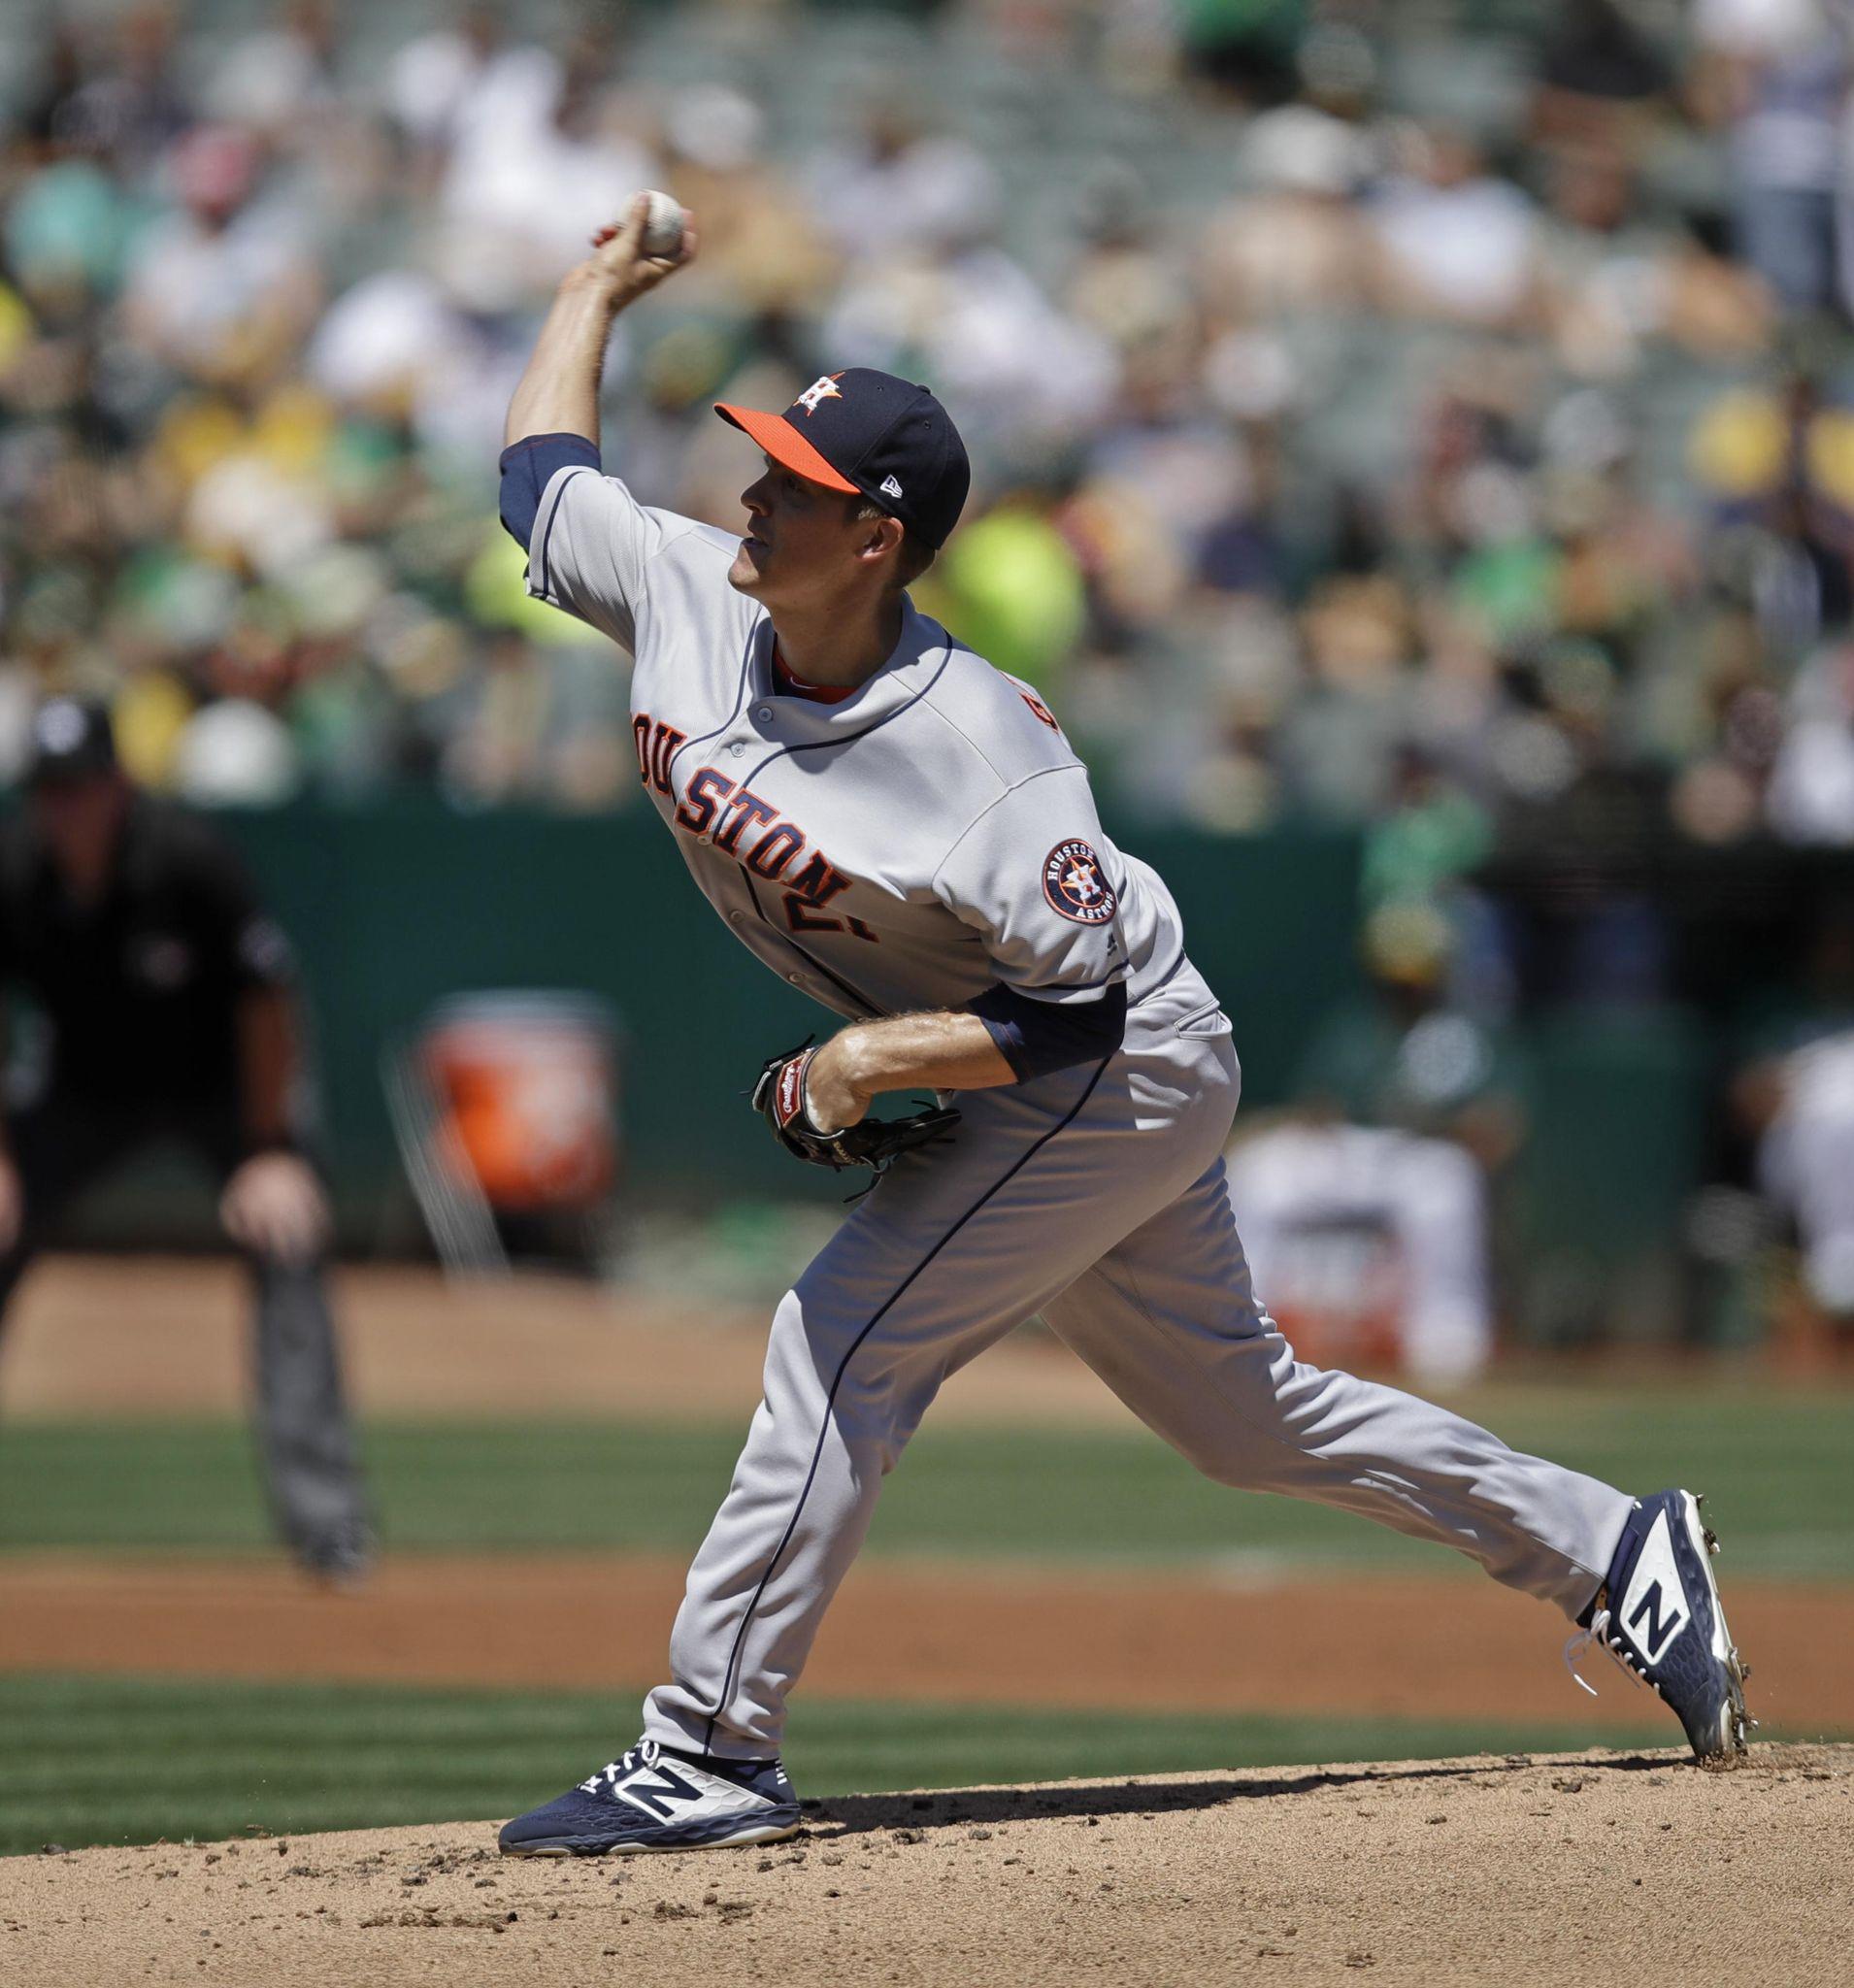 Astros_athletics_baseball_95206_s1910x2048